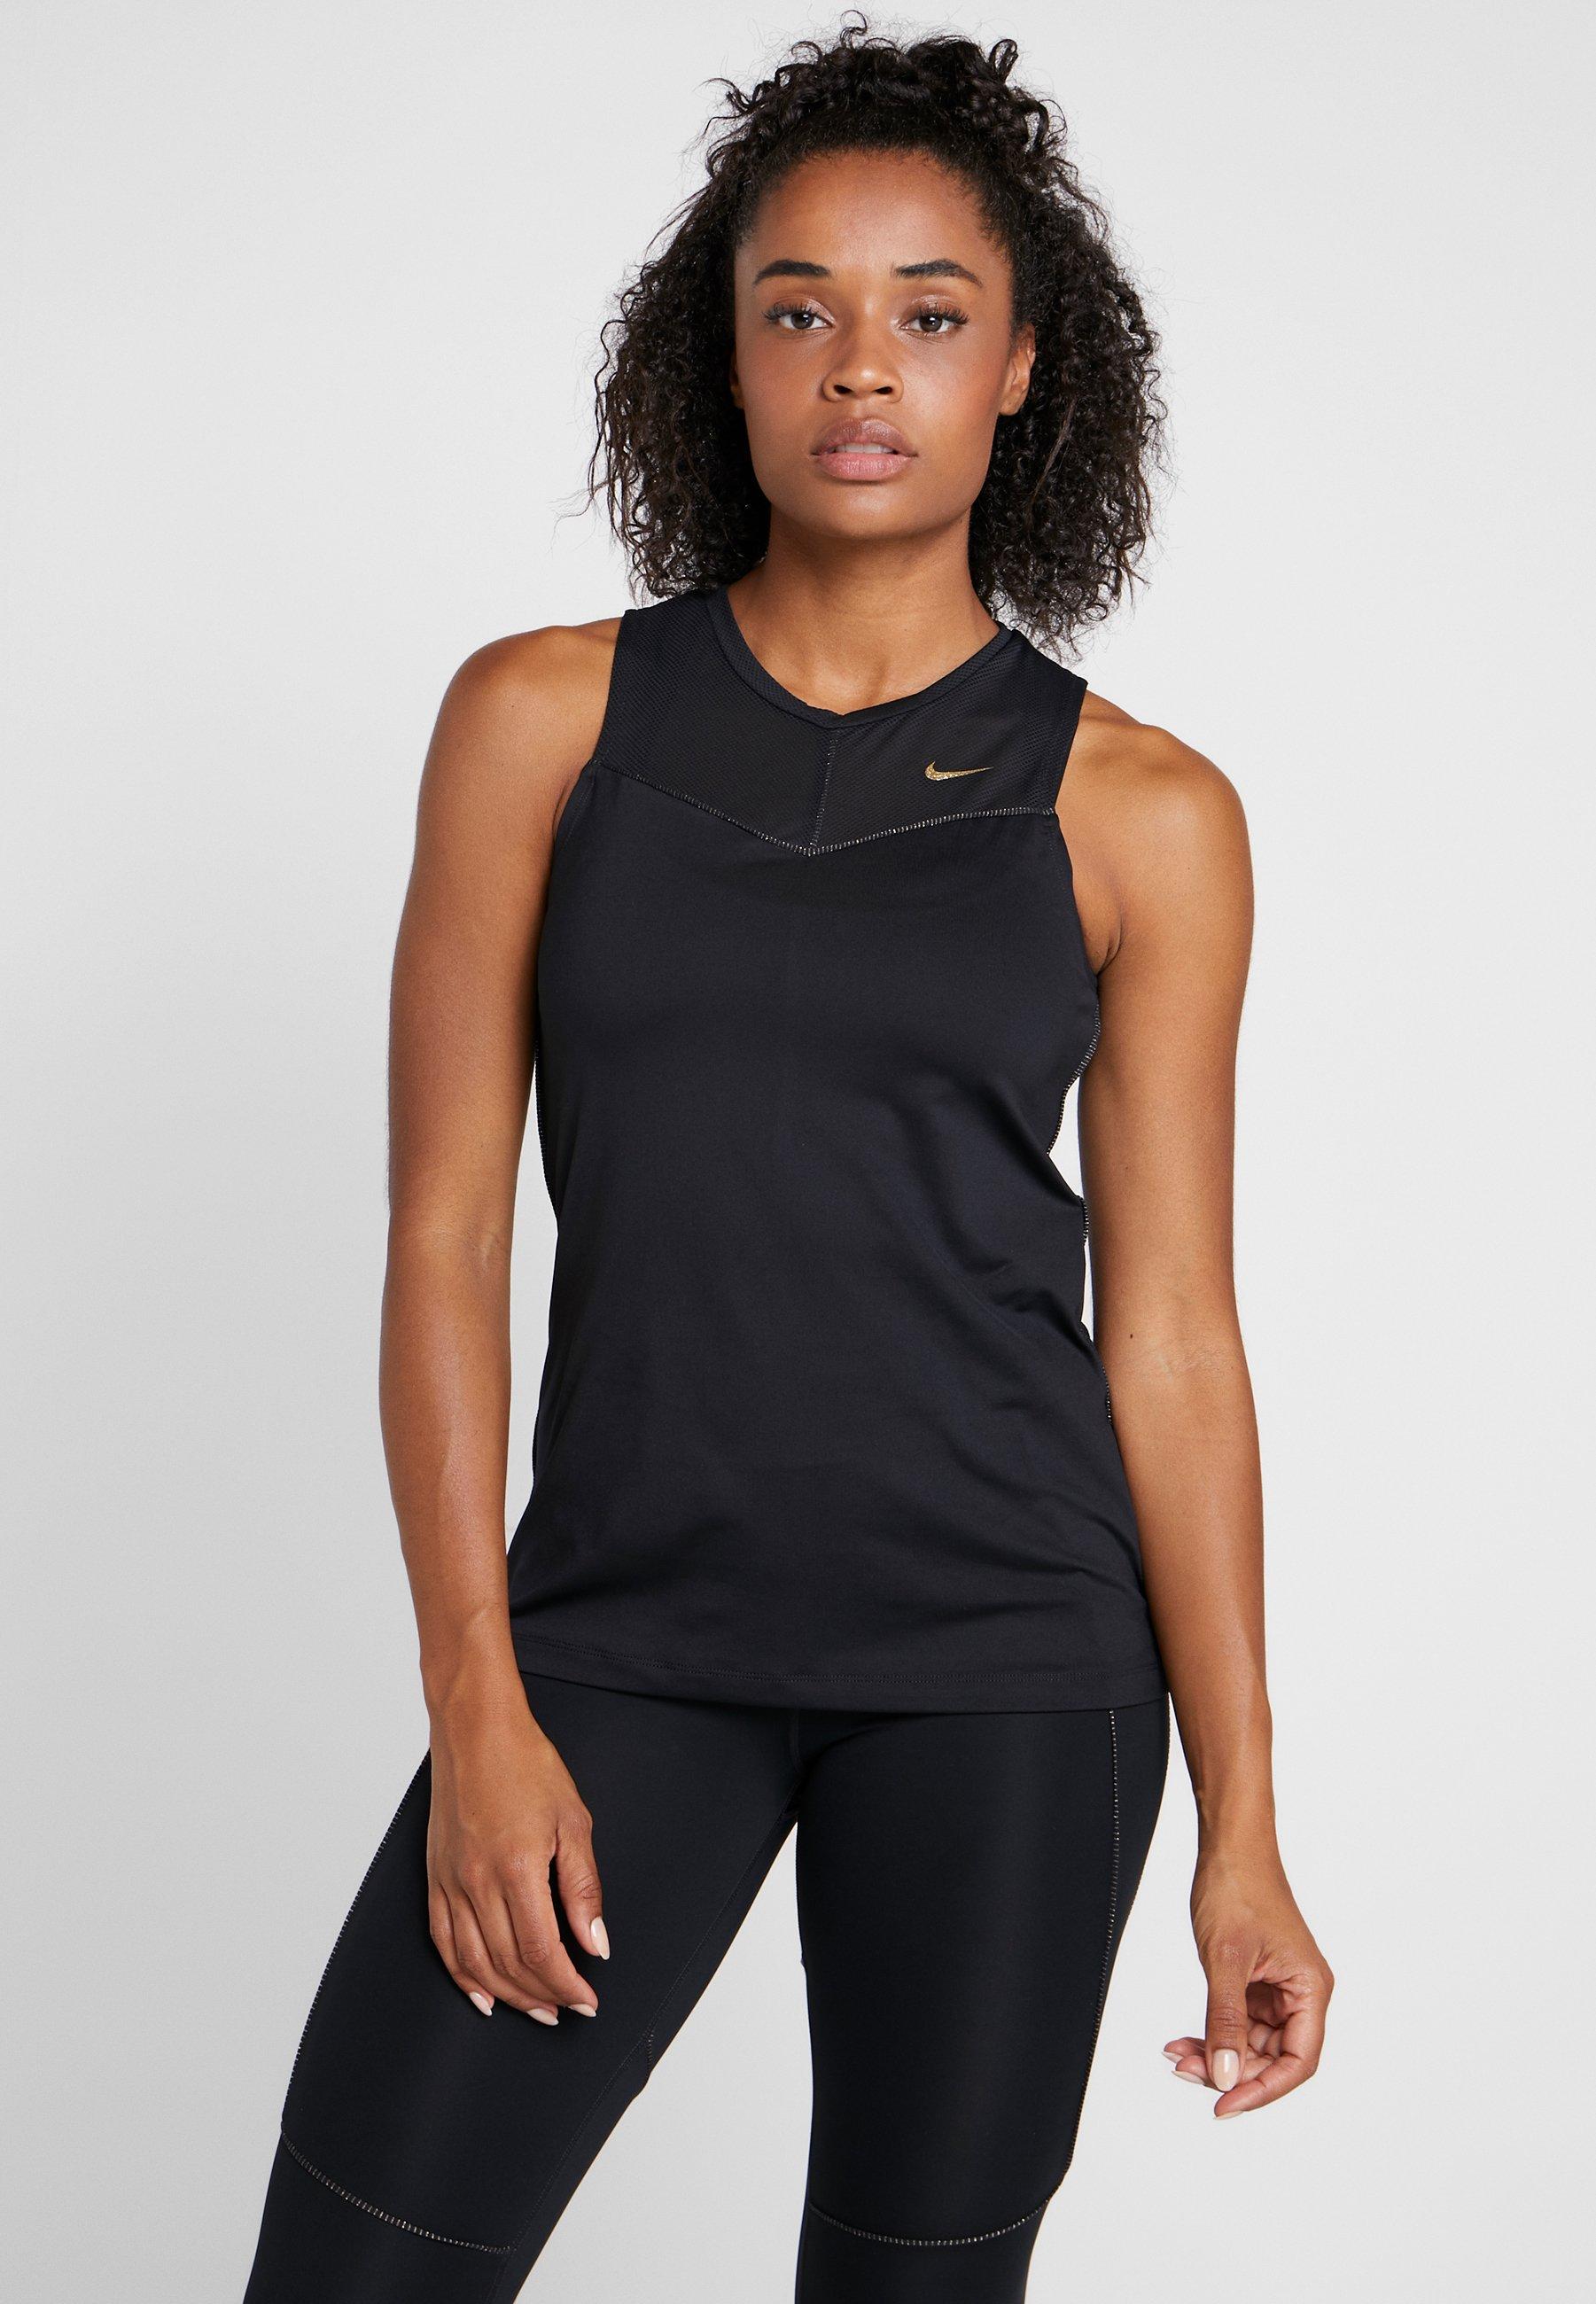 Black TankT Fierce shirt Gold Sportiva Nike Performance metallic 13JFKTlc